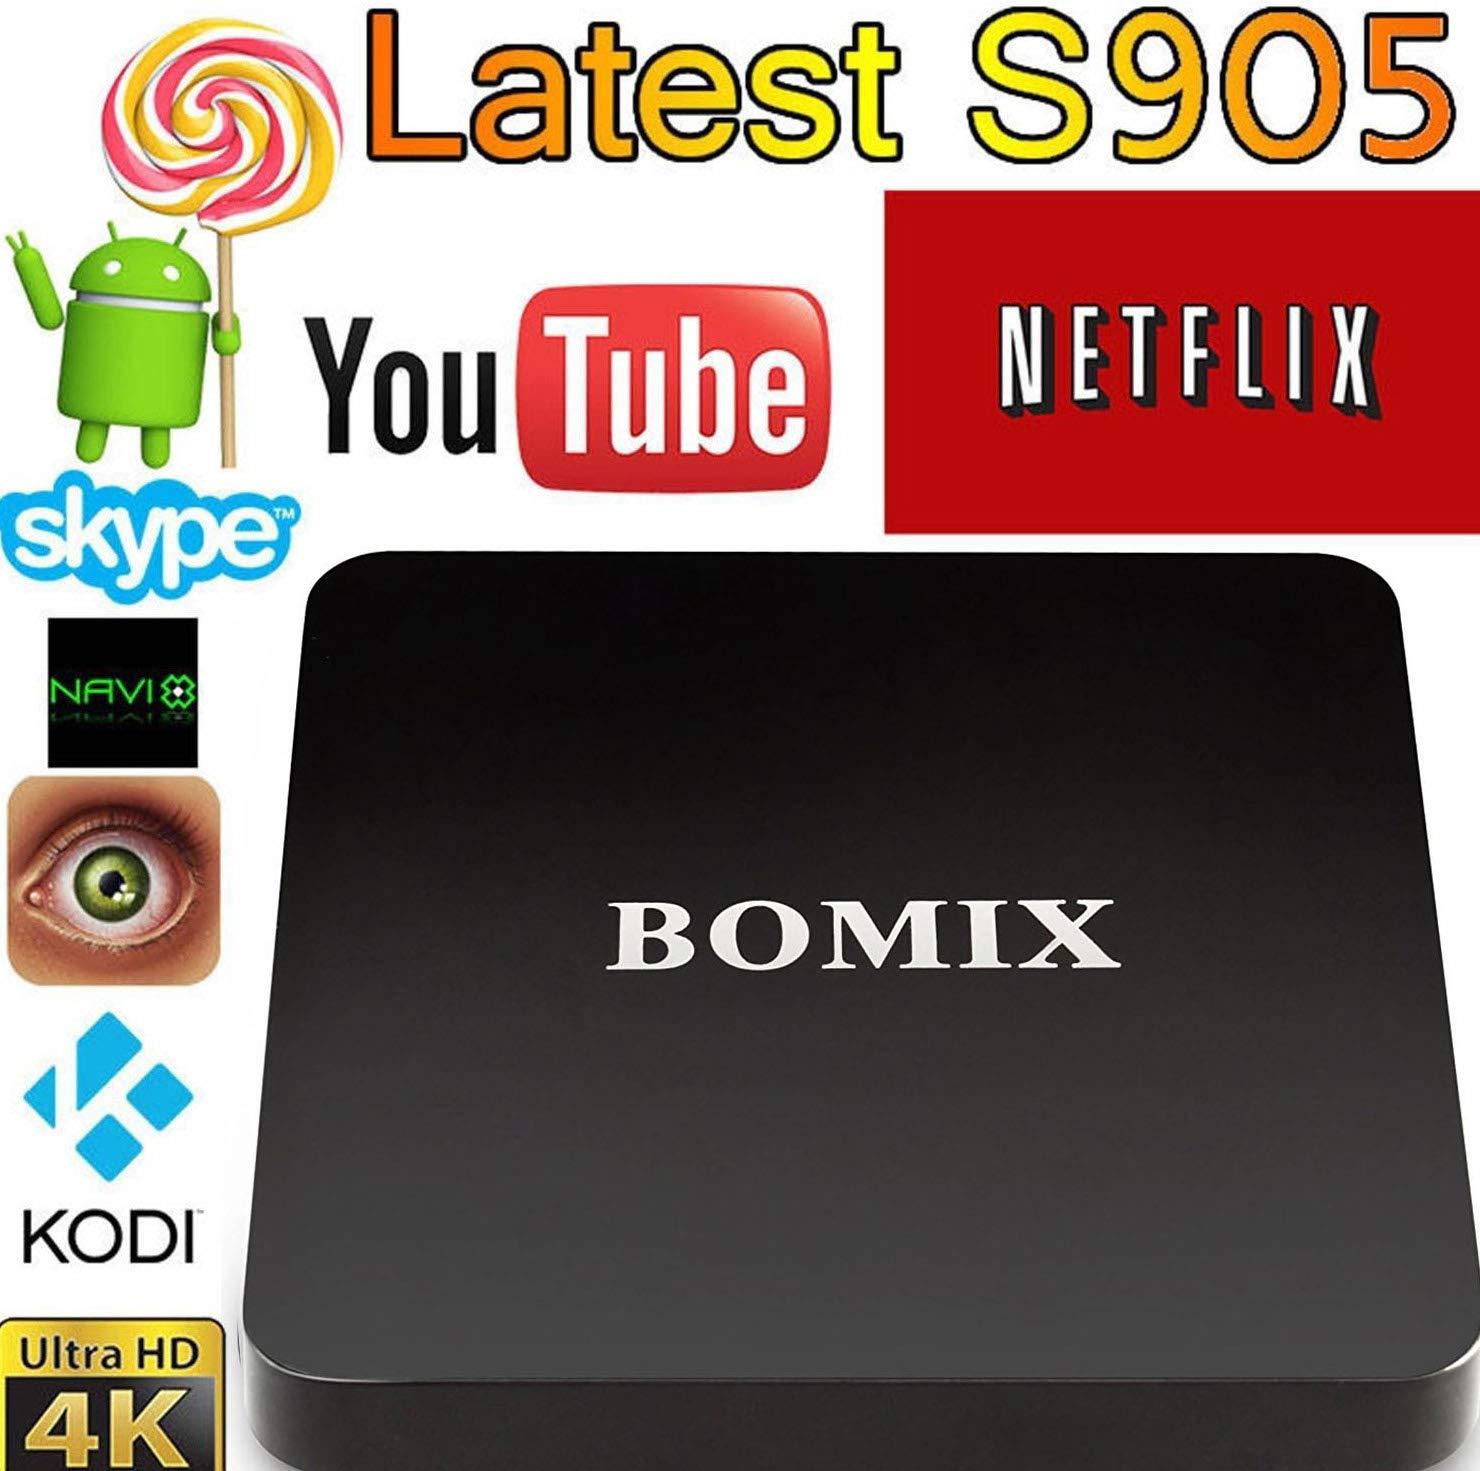 MXQ Pro Game Pad mxq15 [2018 MODEL] KD V17.4 MXQ PRO Android 6.0 TV BOX 4K/64Bit/1+8GB/2.4G/5G Wifi/UHD 4K/Full HD/H.265